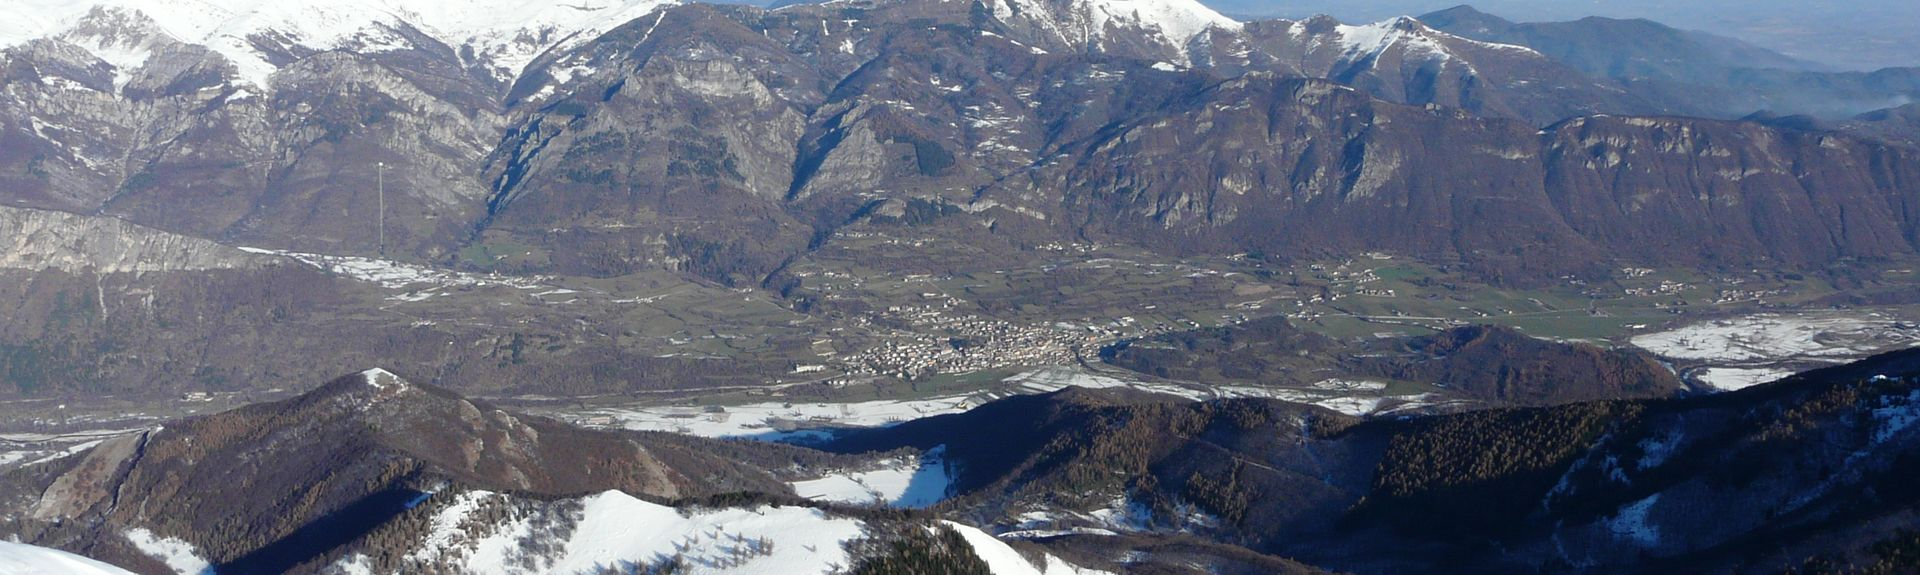 Colle Fauniera, Demonte, Piemonte, Italia